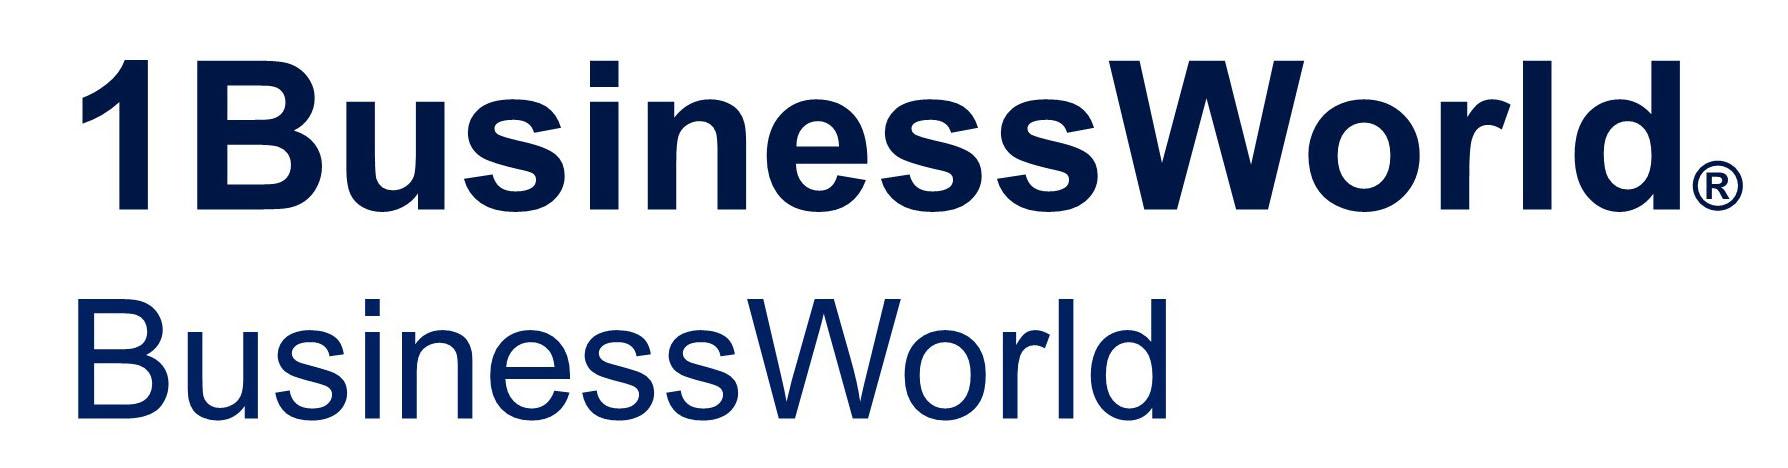 1BusinessWorld BusinessWorld